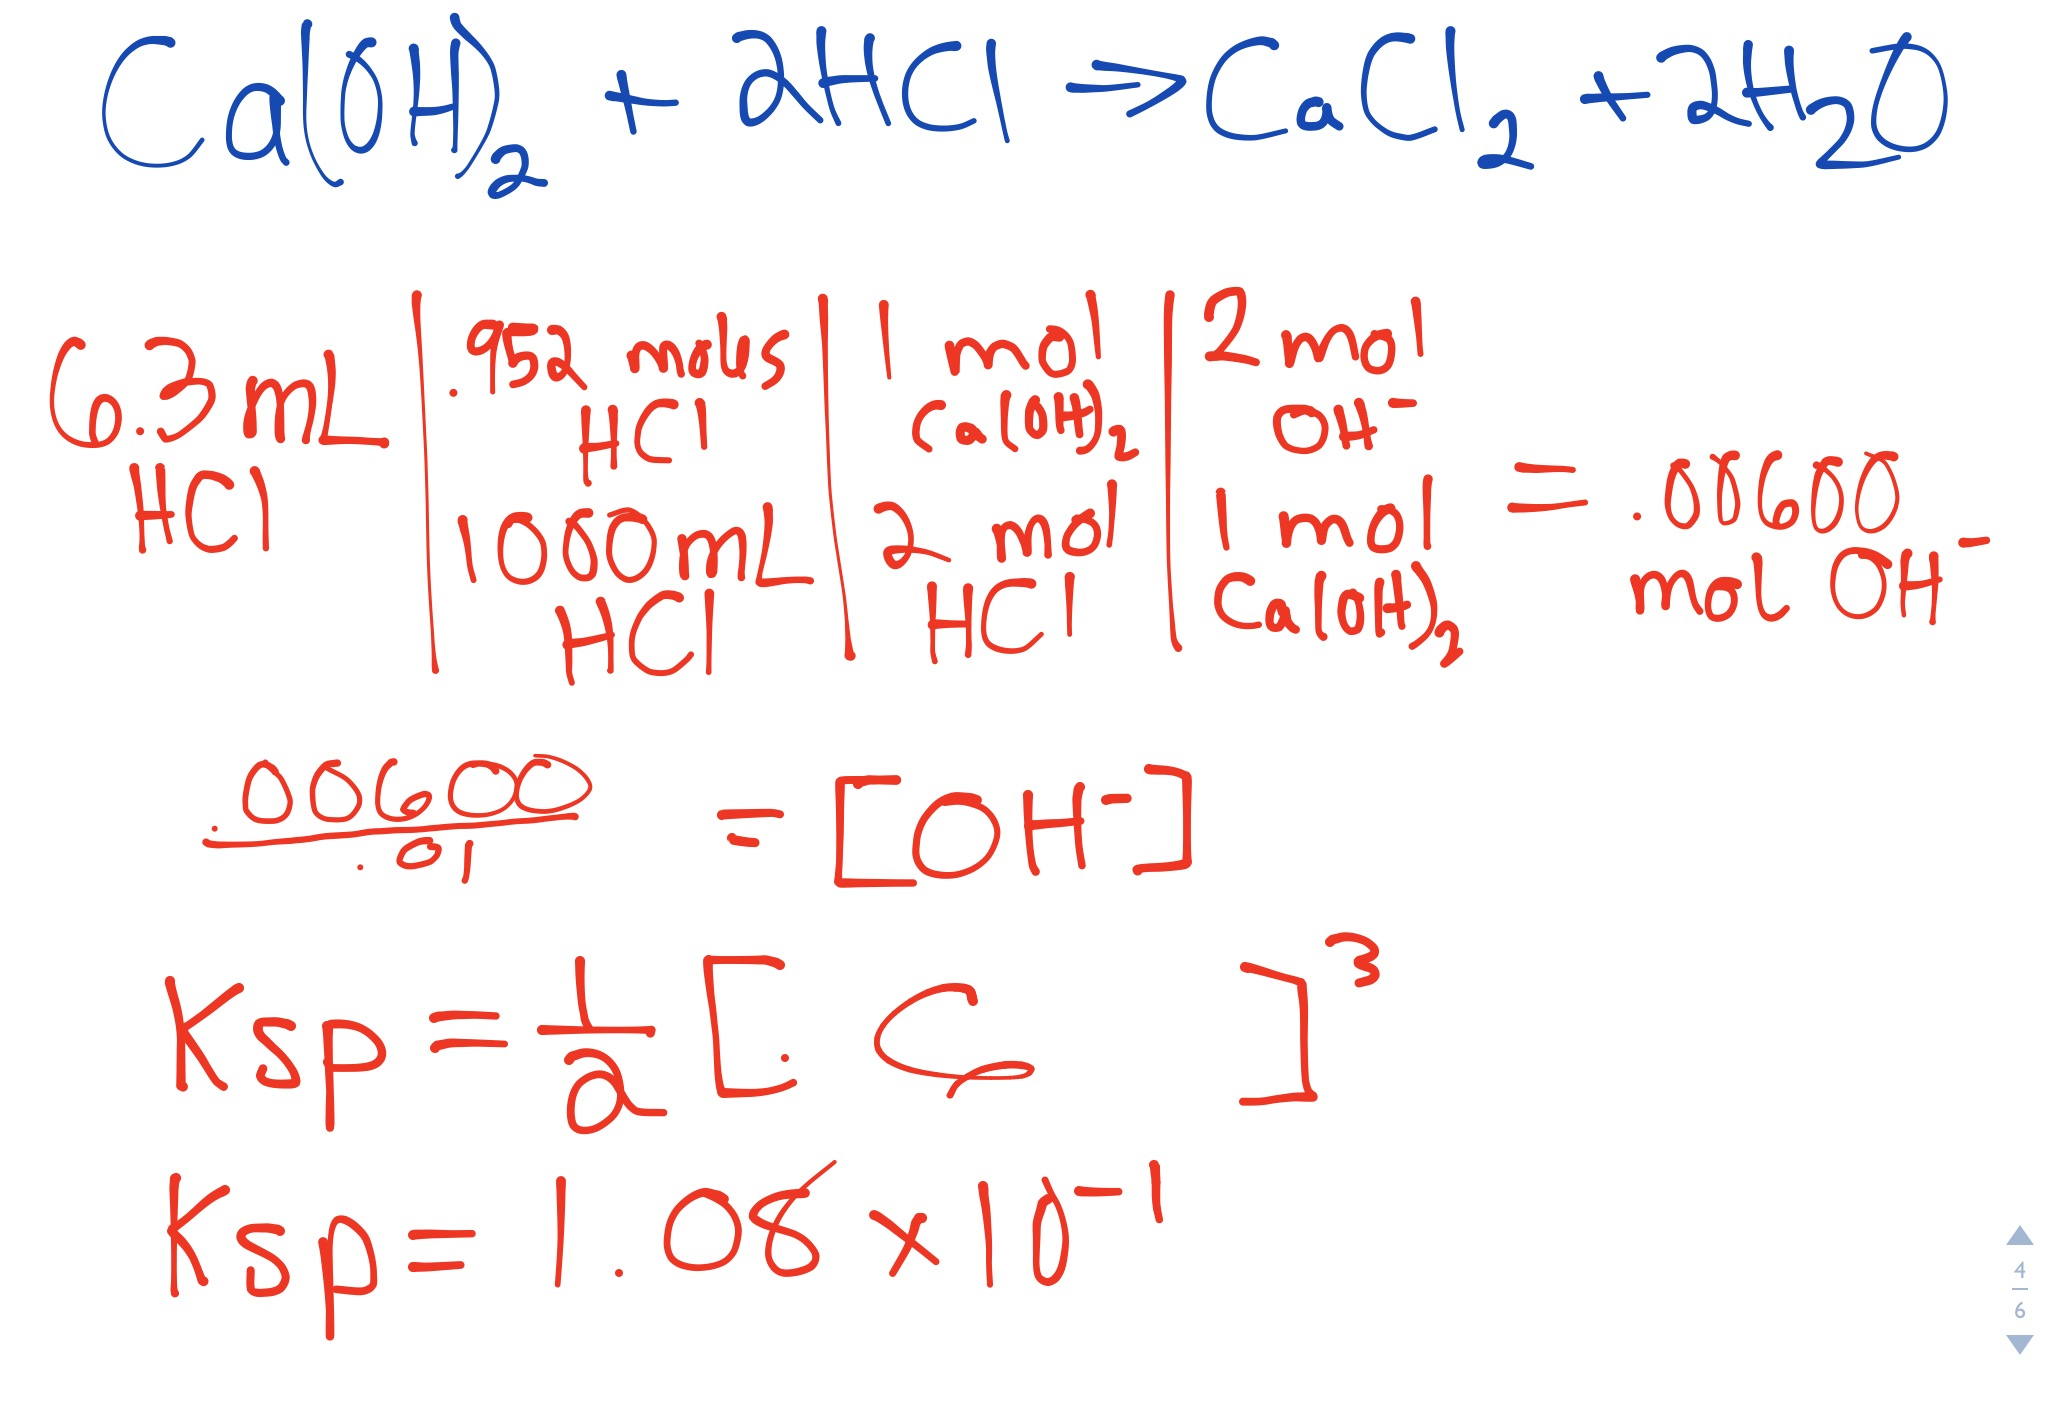 Ksp Of Calcium Hydroxide At Different Temperatures What